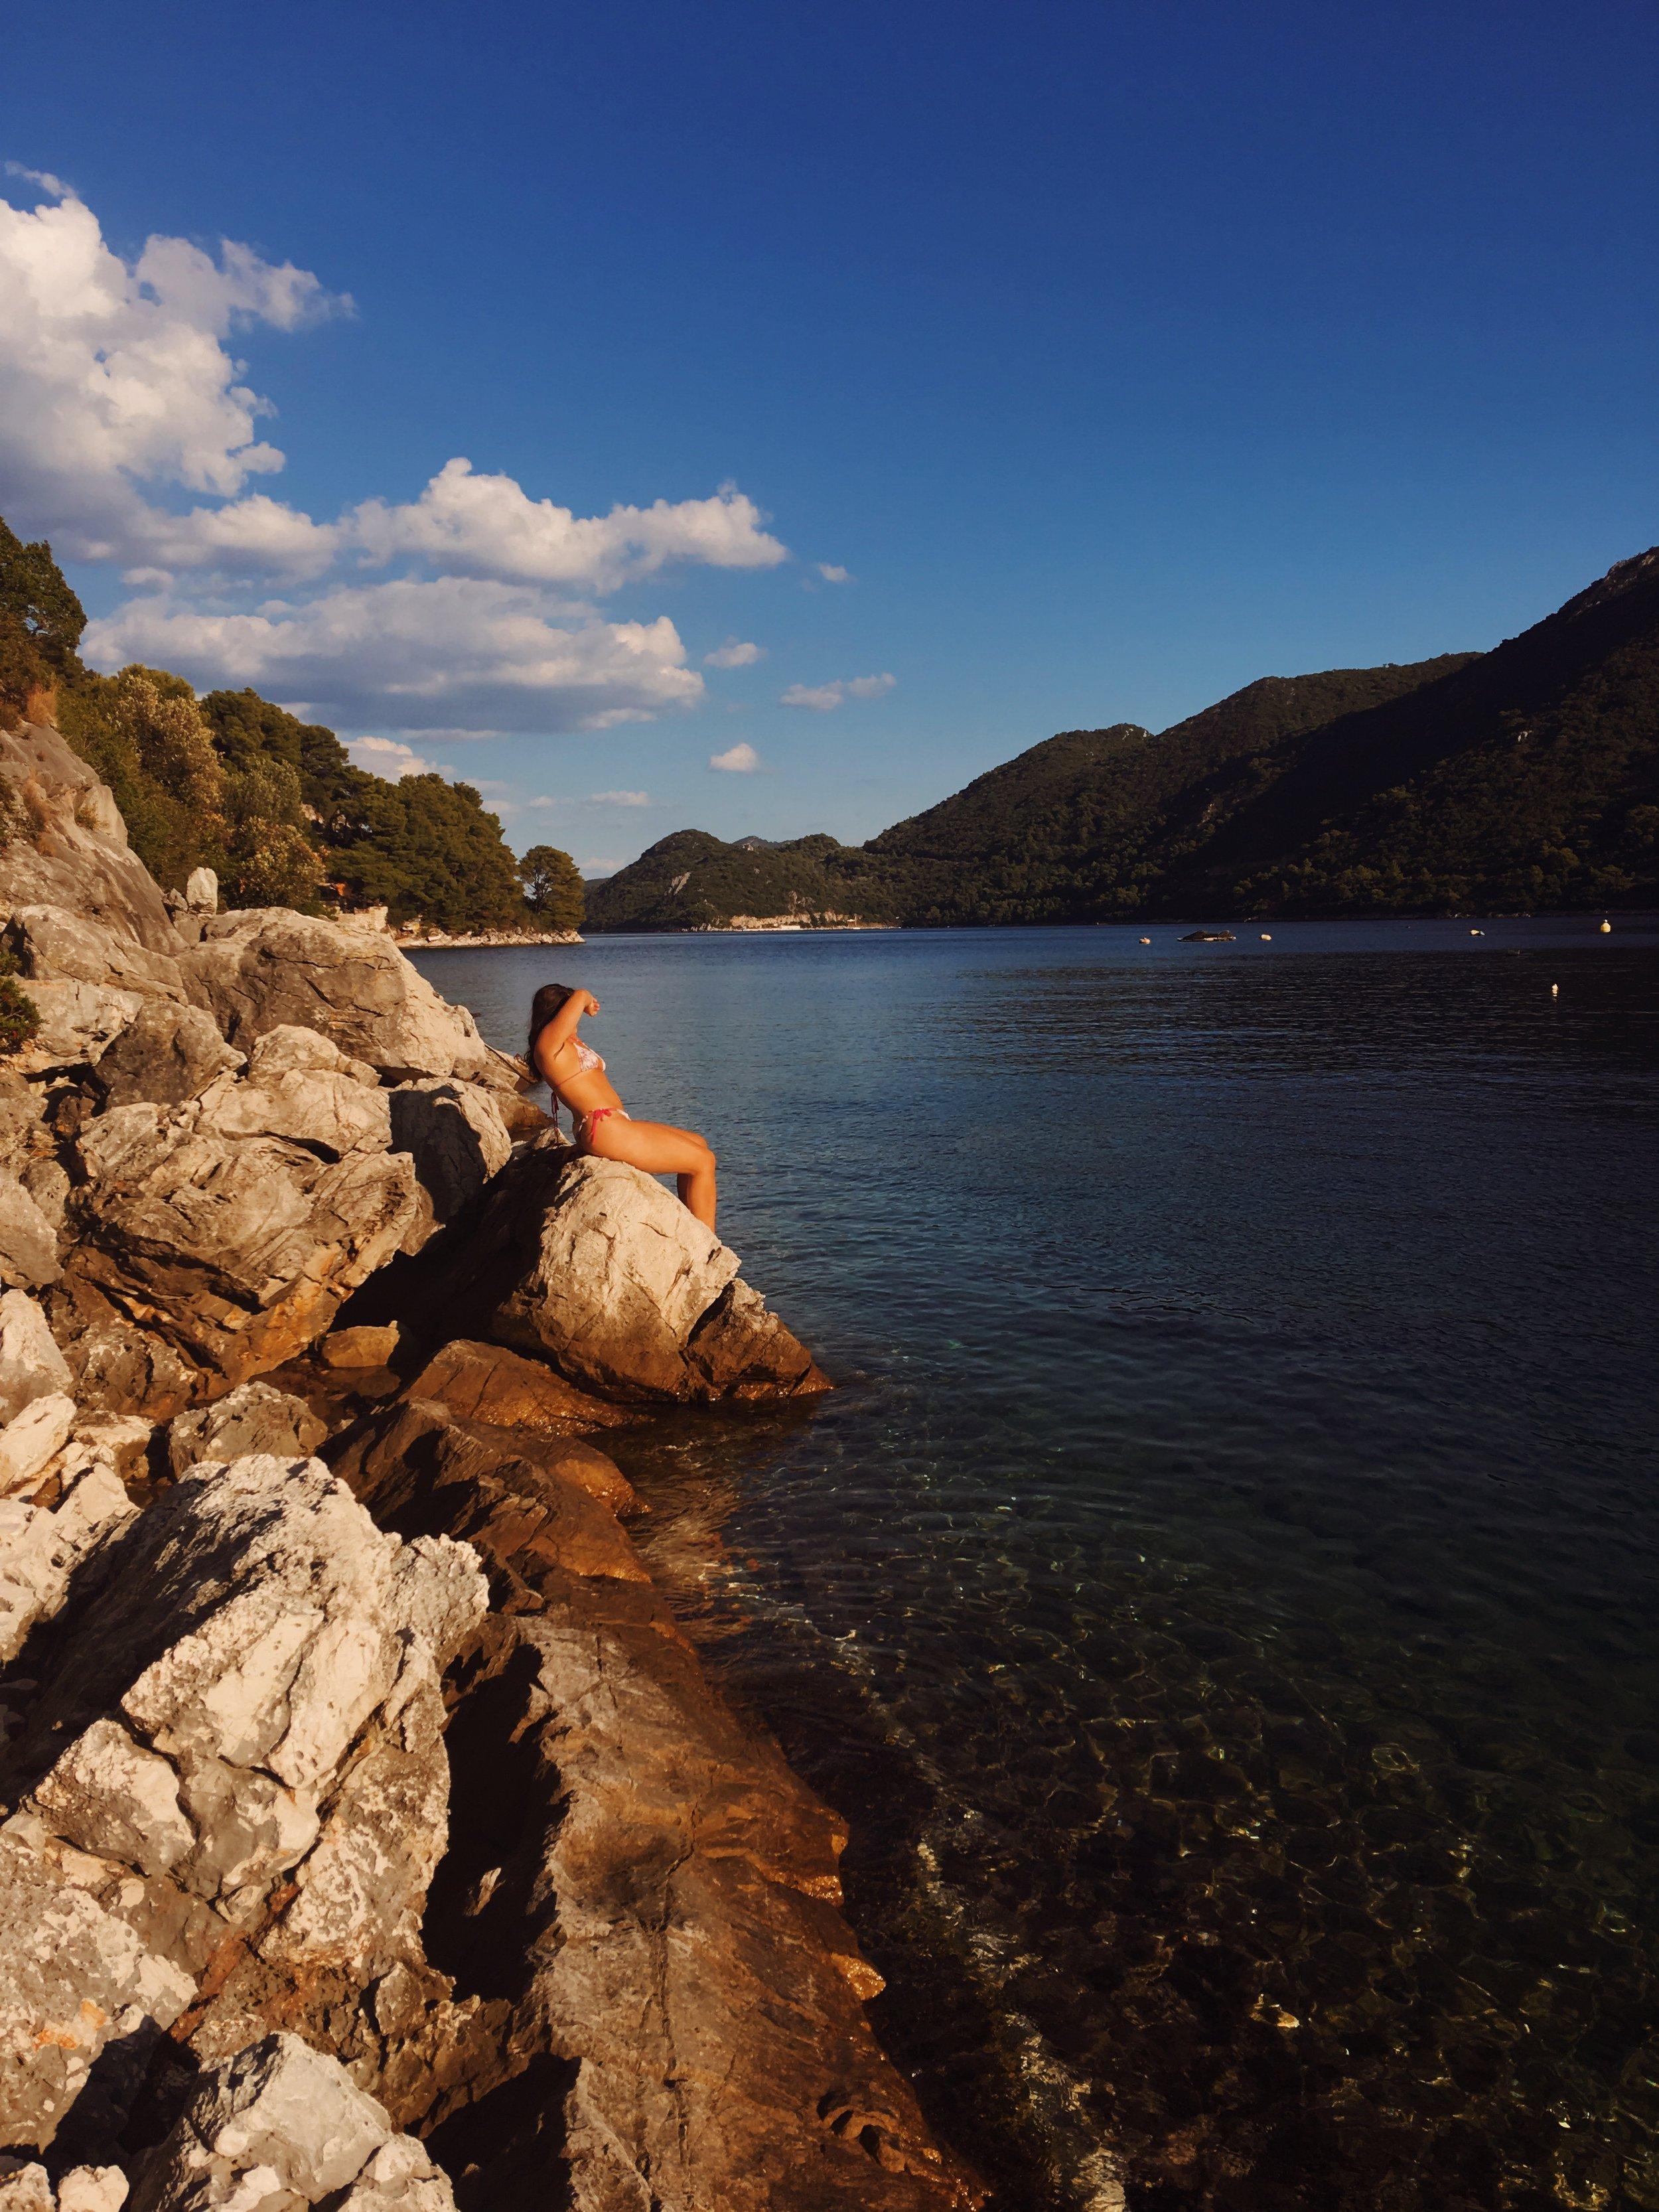 jasminehardingmakeup.com - a visual postcard from Croatia